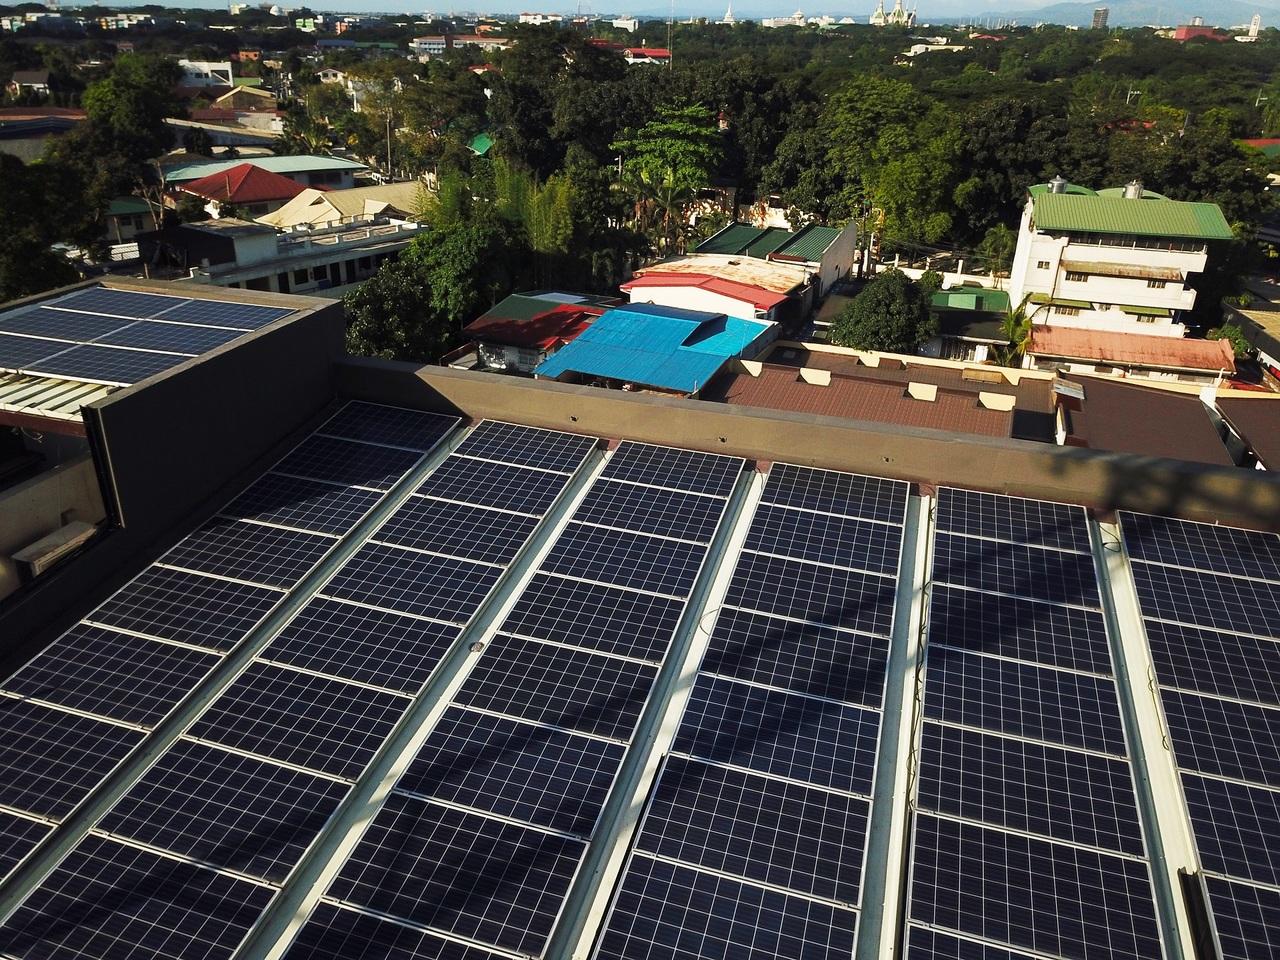 A solar panel blocked by shade